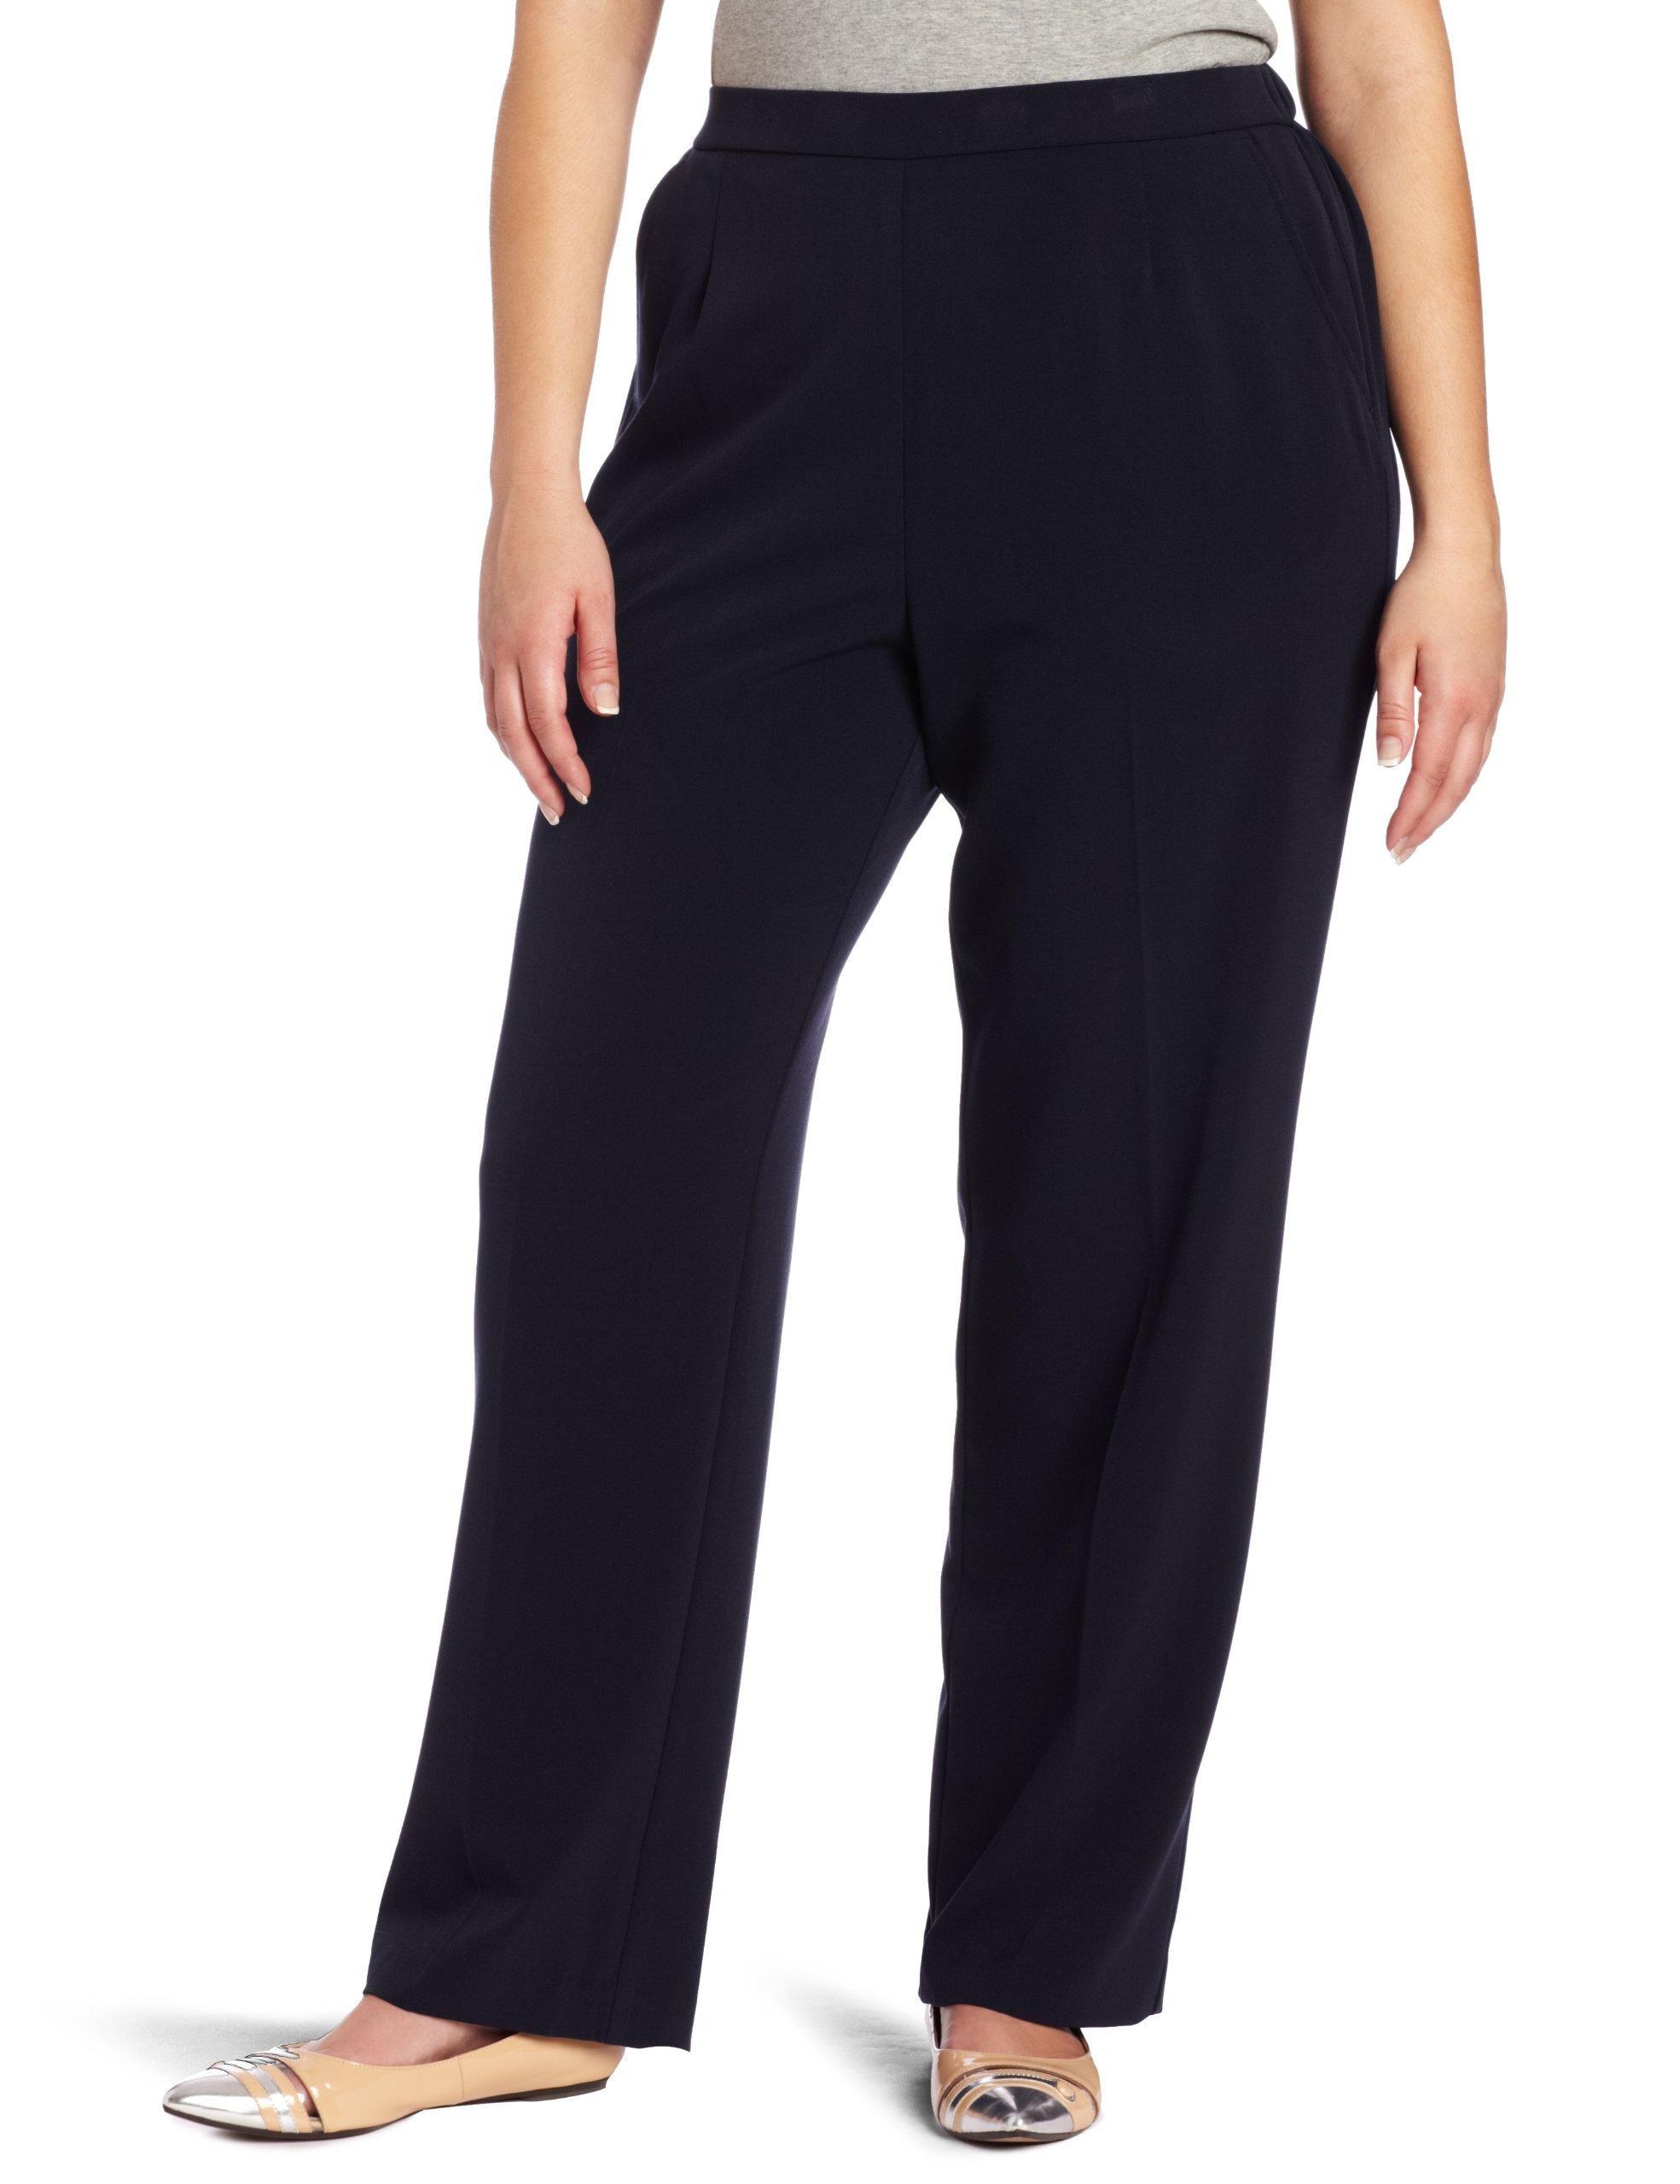 Briggs New York Women's Average Flat Front Pant, Navy, 22